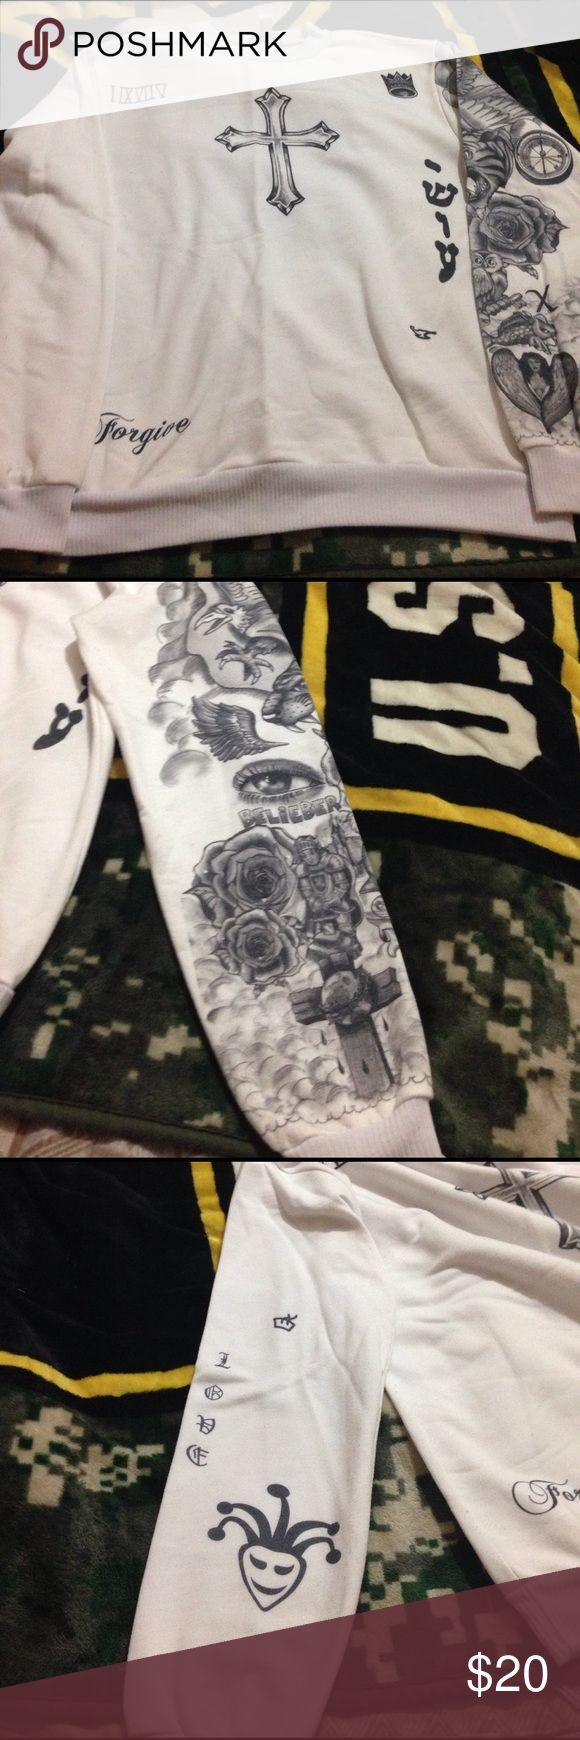 Justin Bieber Tattoo Long sleeve top Worn. Has numbs. Price reflects. Originally around $50 online freshtops Tops Tees - Long Sleeve